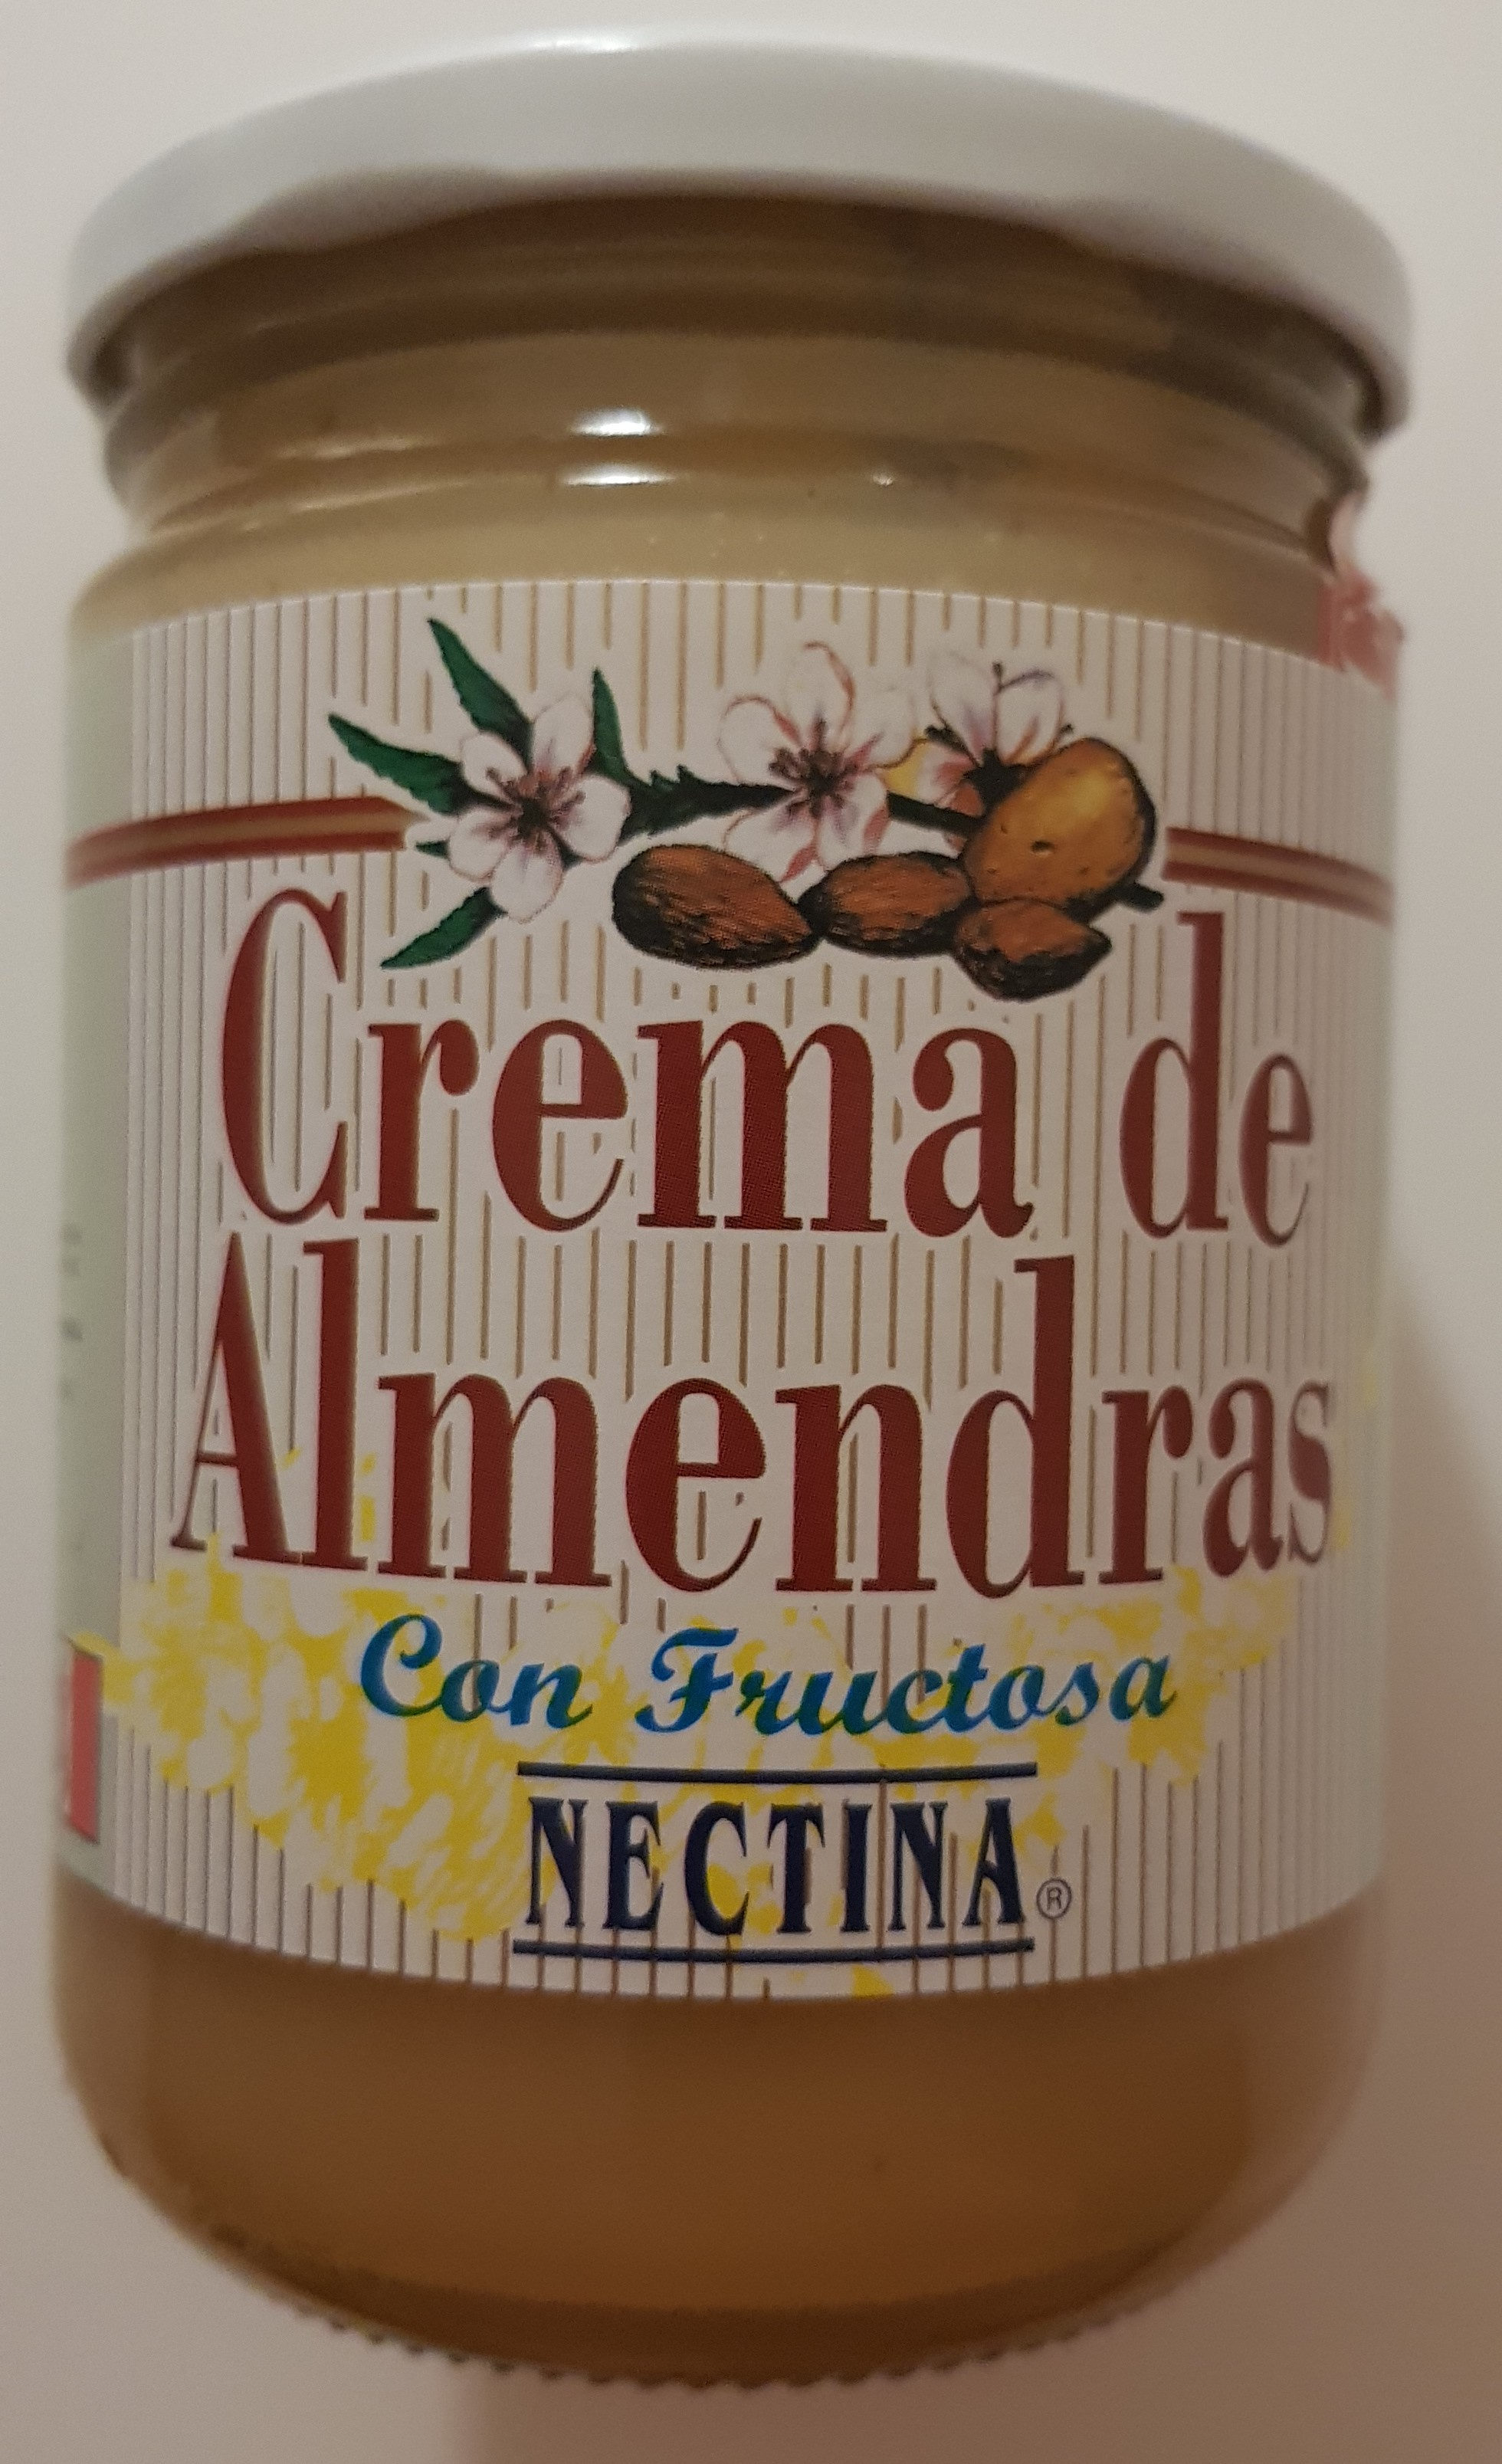 Crema de almendras con fructosa - Producte